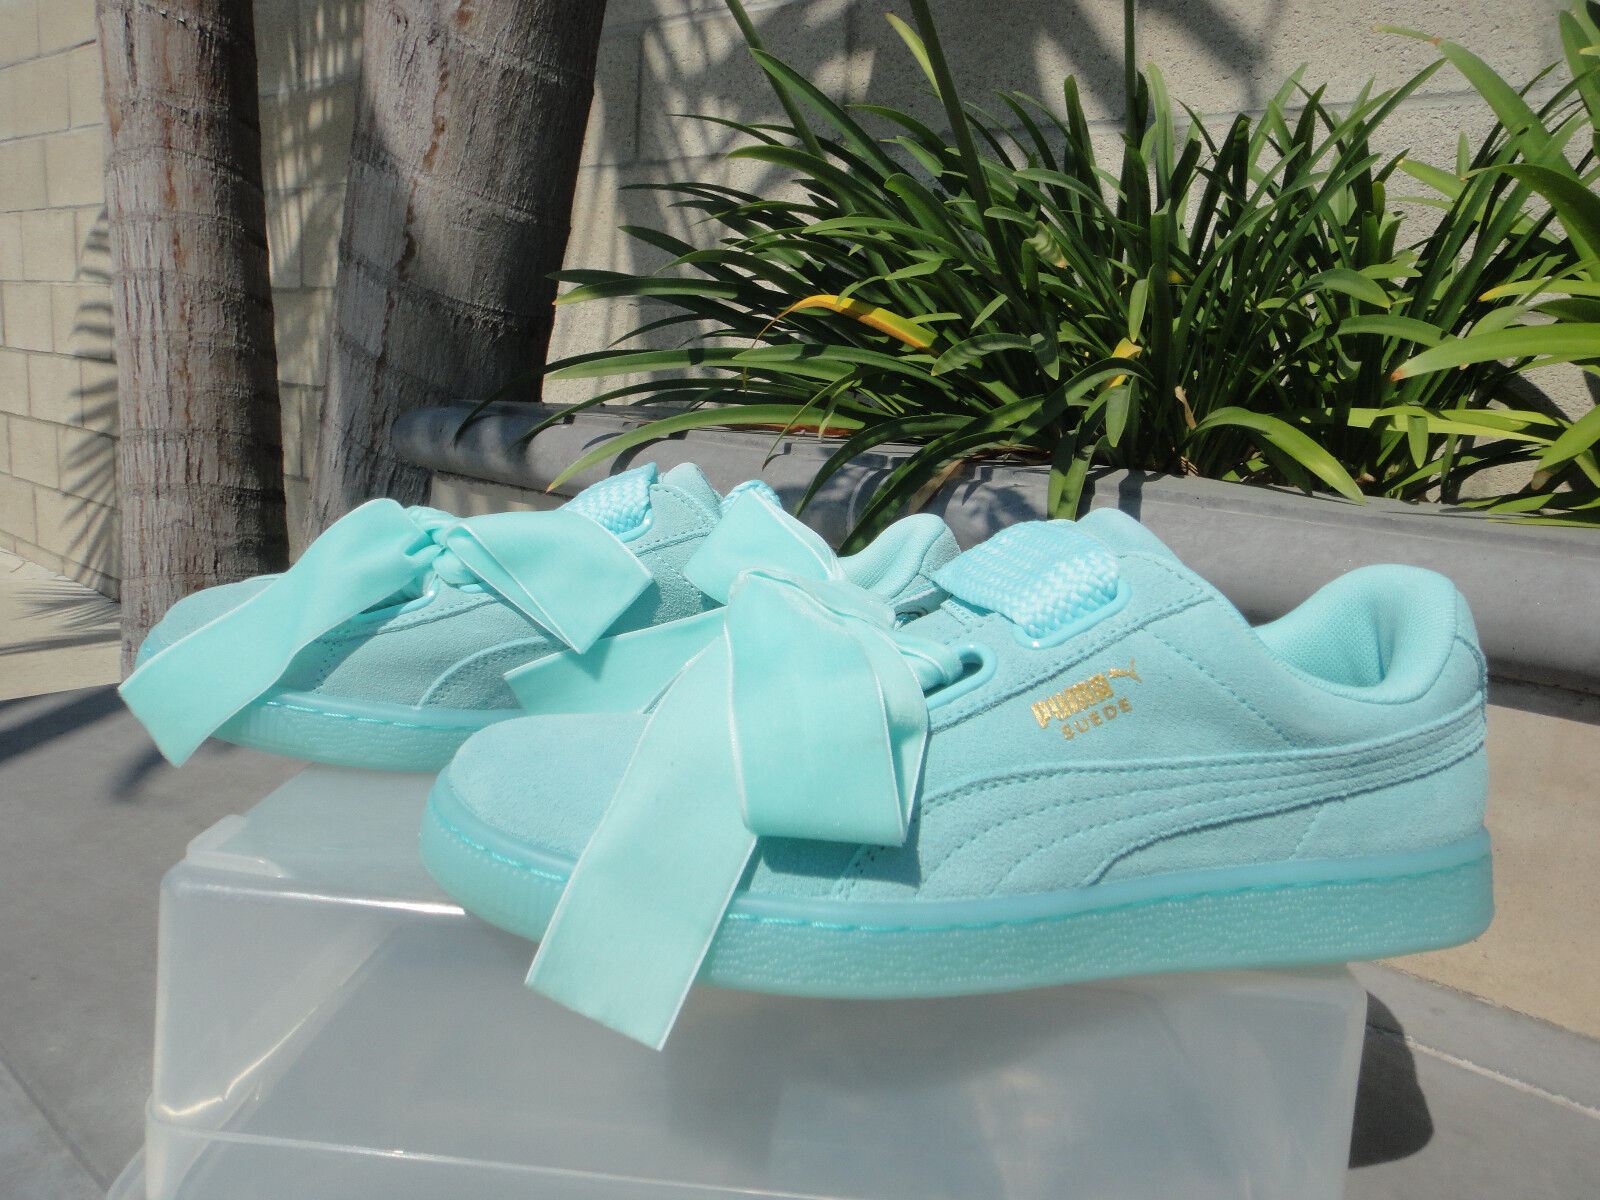 Puma HEART RESET Sneaker, Soft Suede & Wide Velvet Laces, Aruba Blue, Pick Size